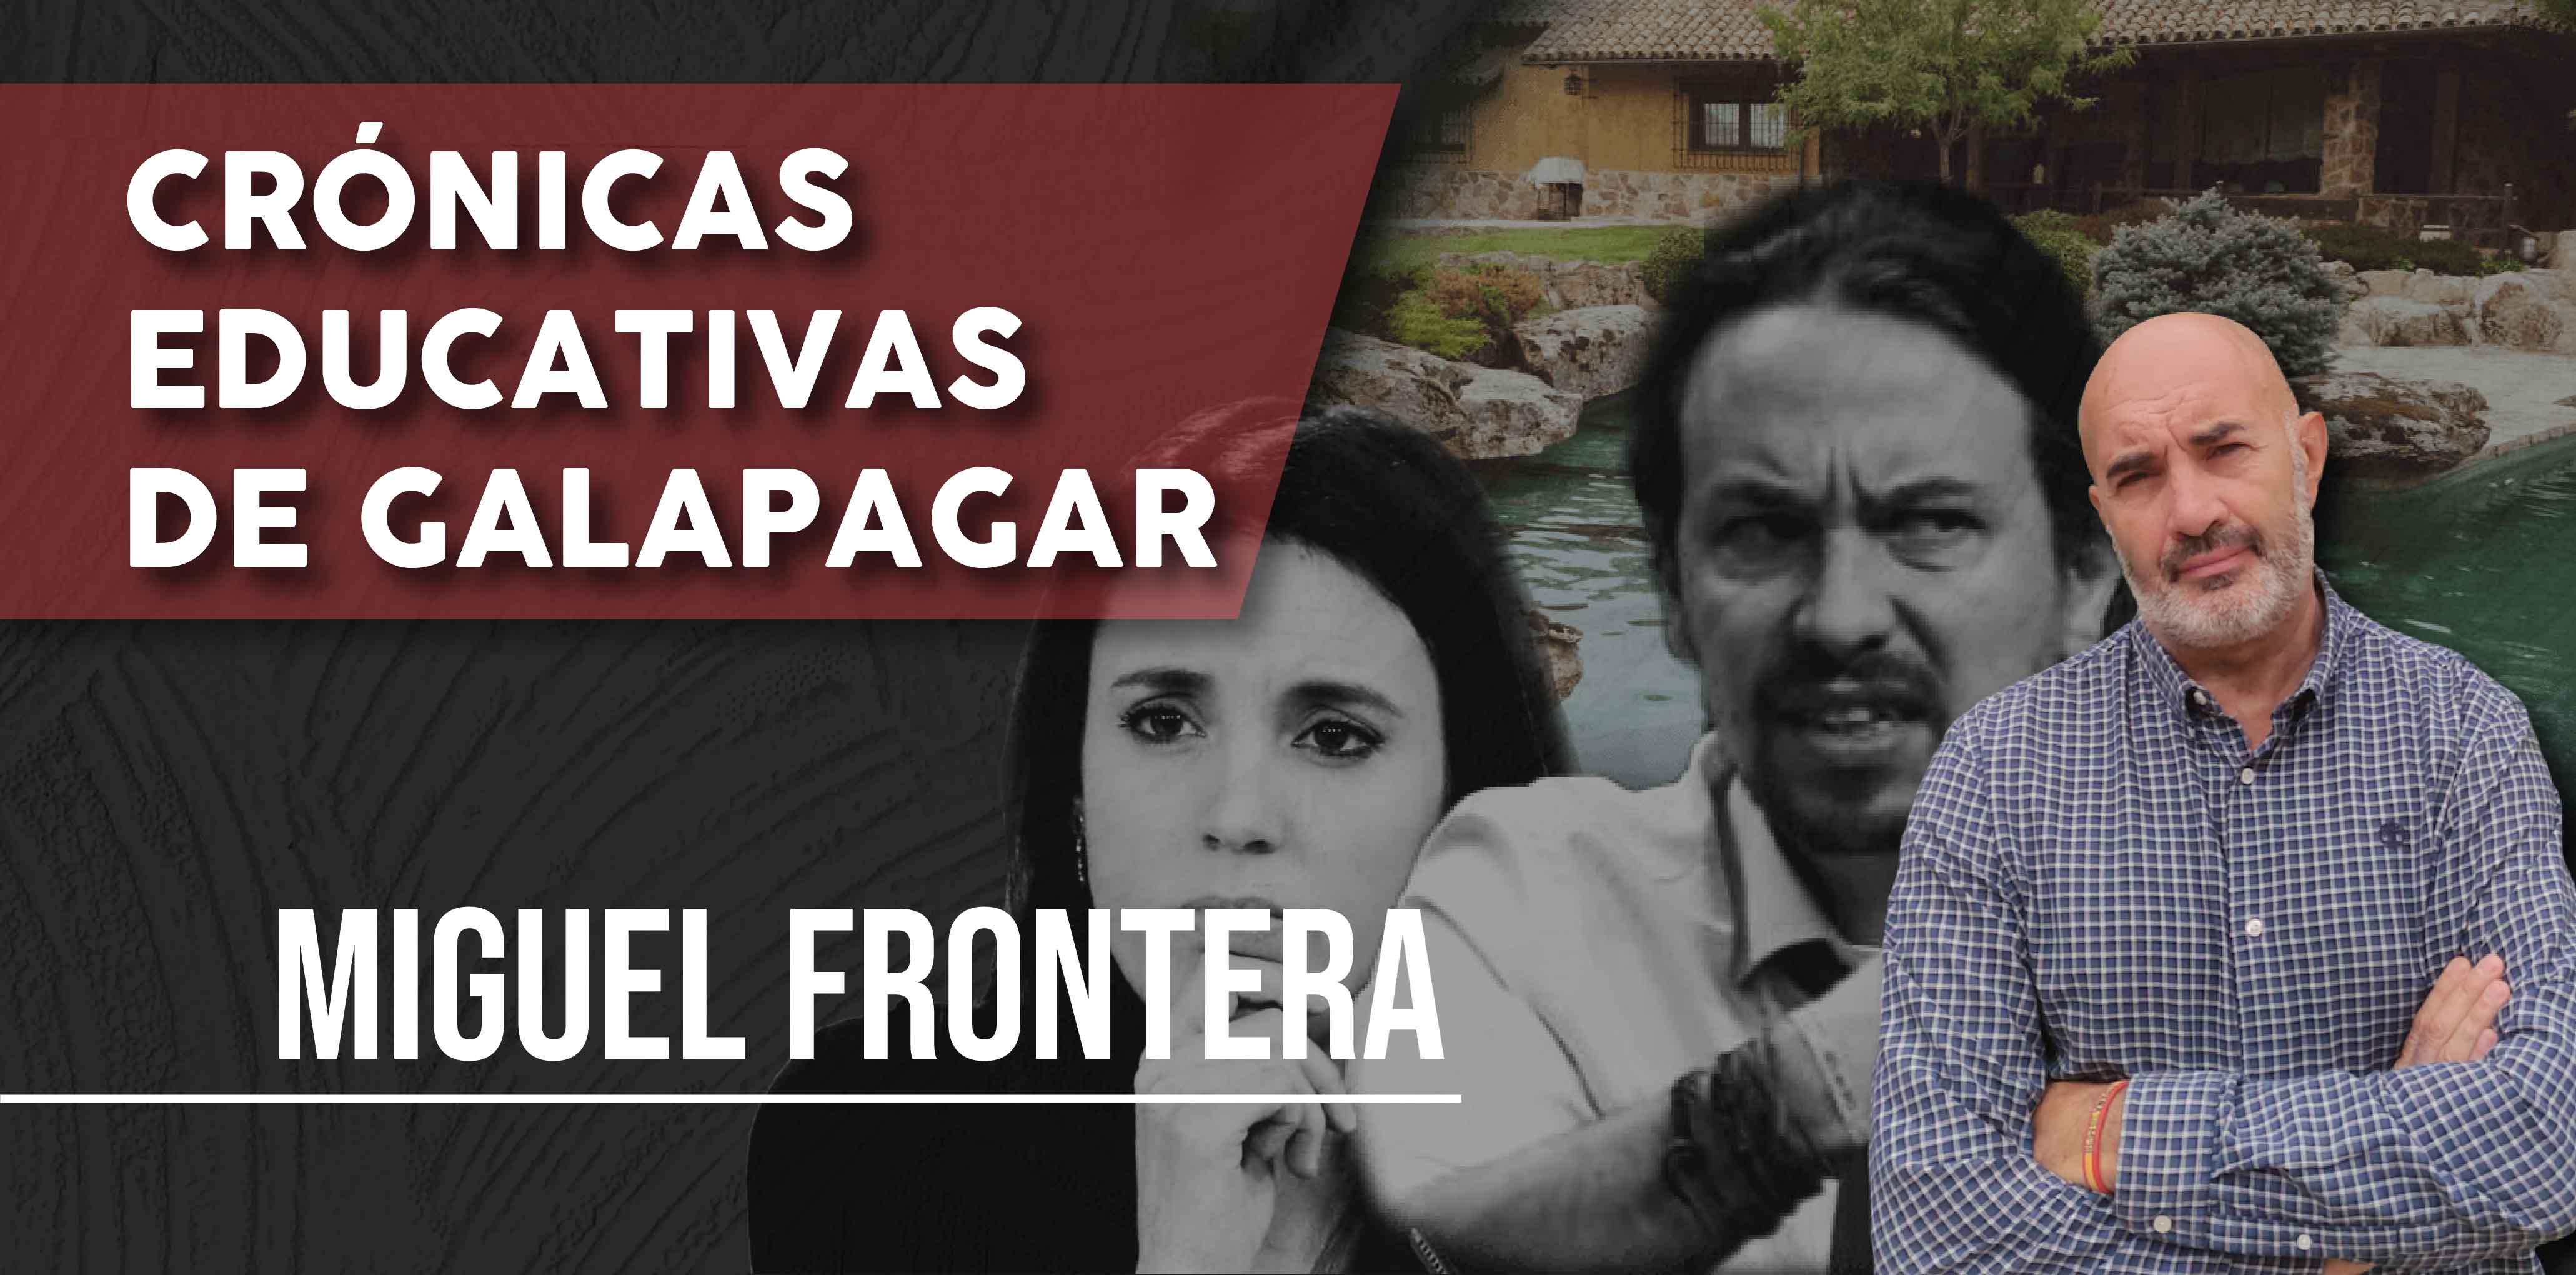 Crónicas educativas de Galapagar